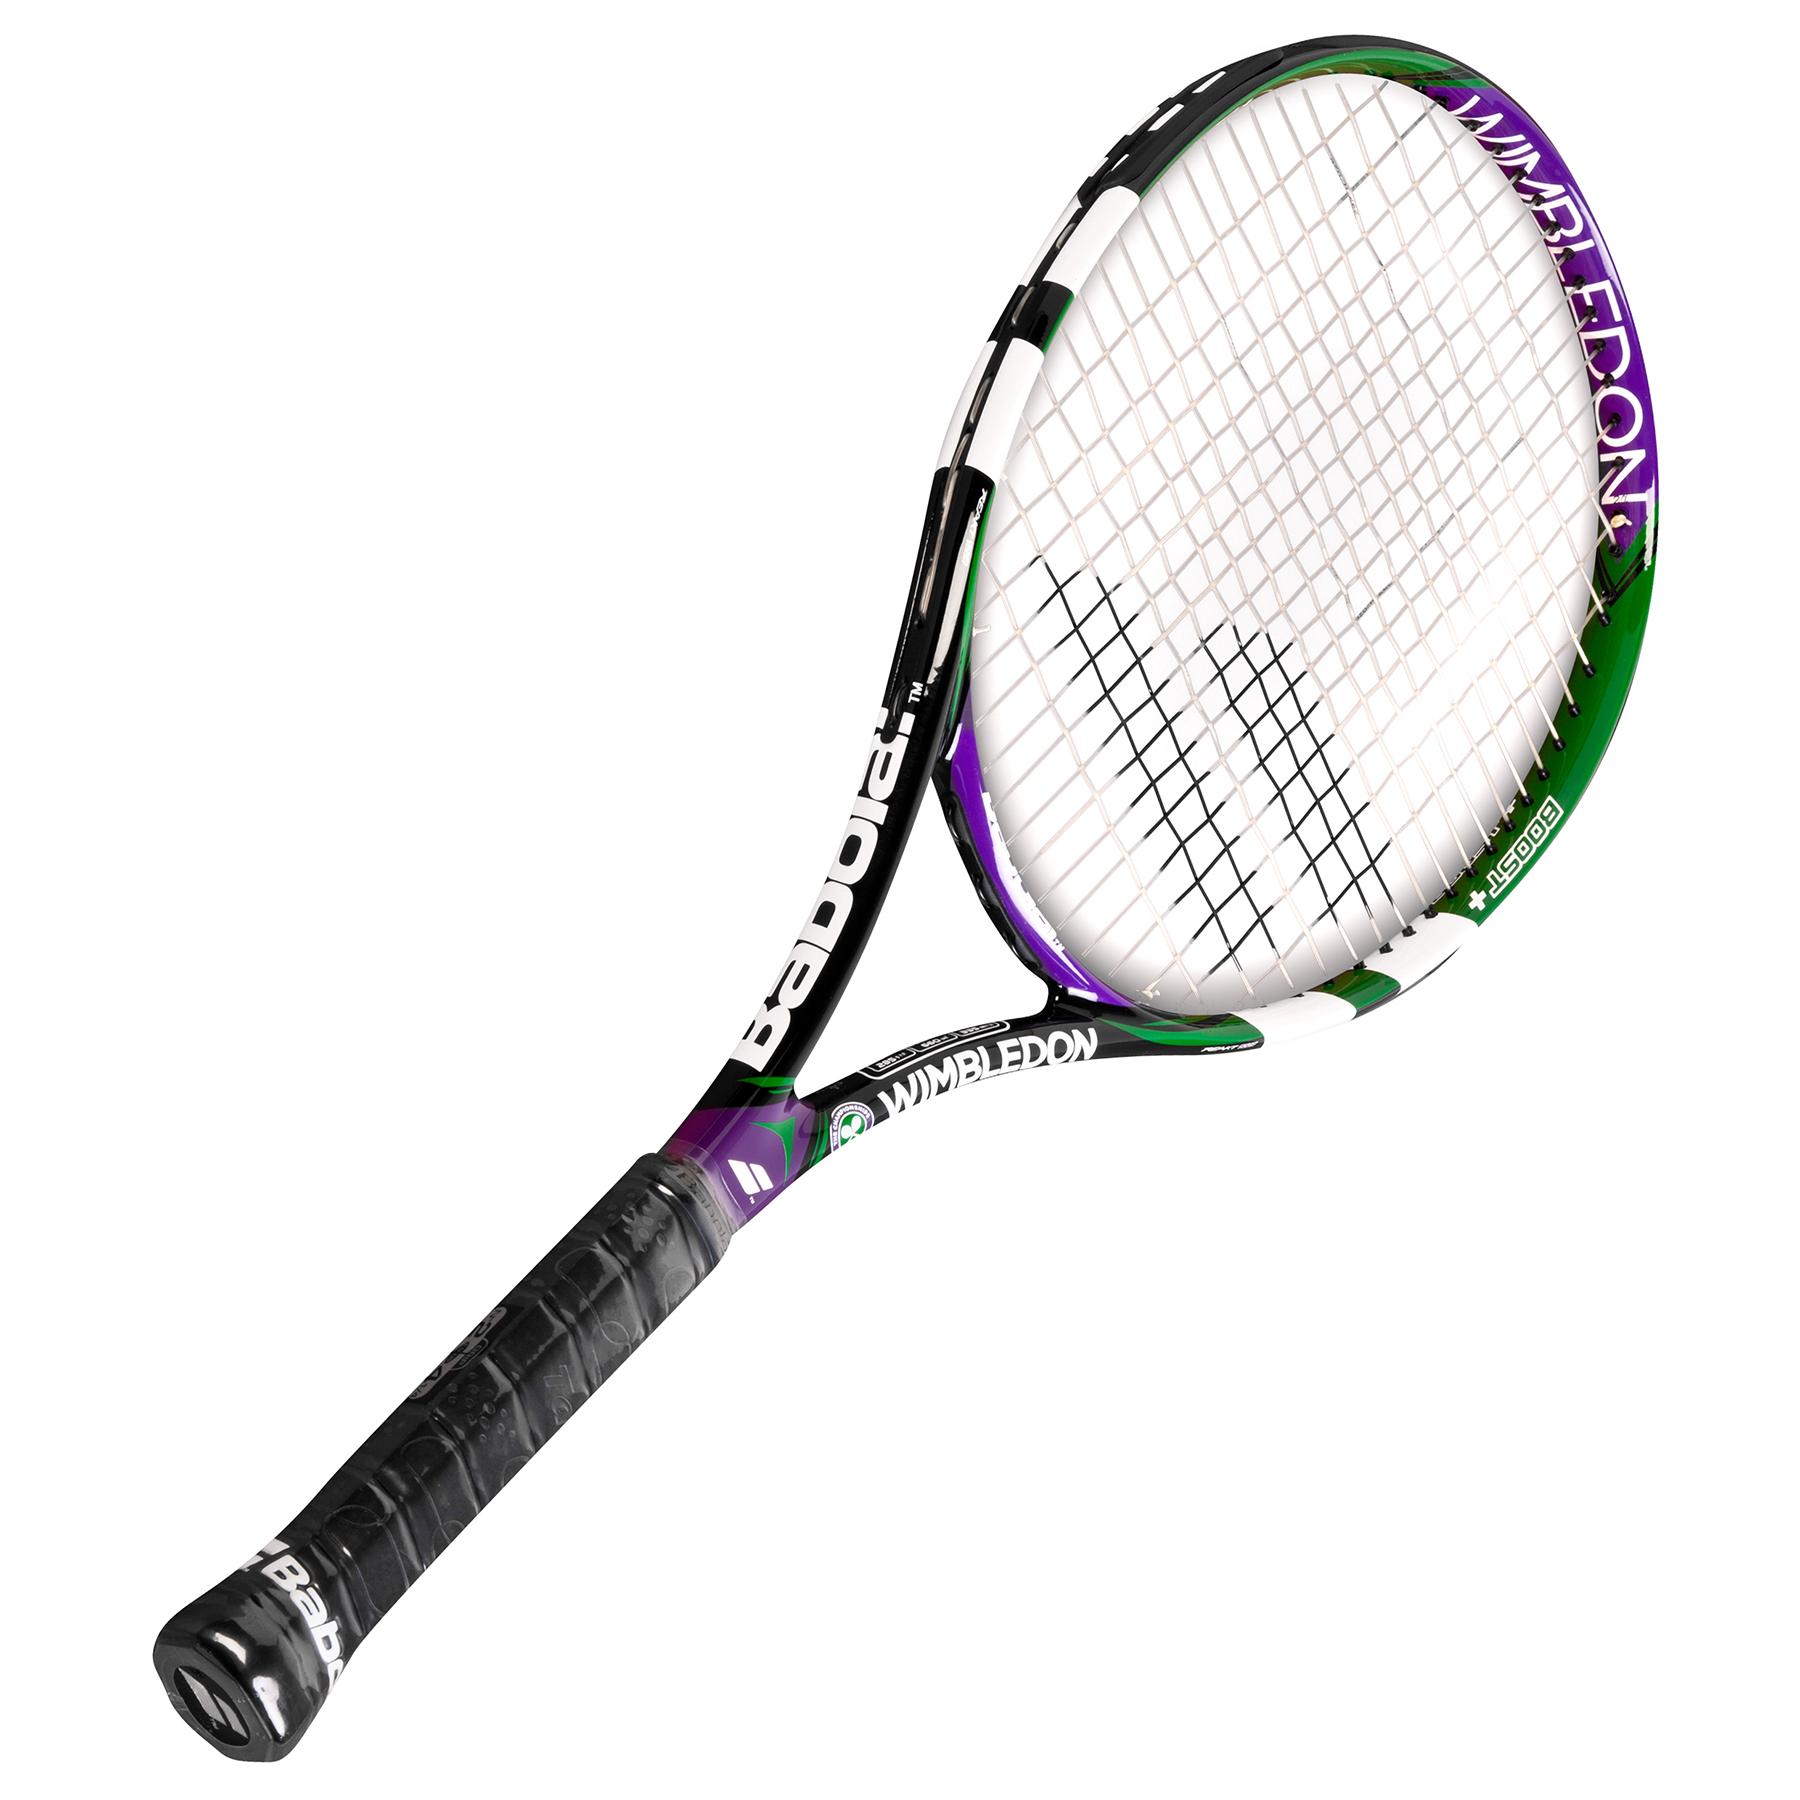 Wimbledon Reakt Tour Racket Black